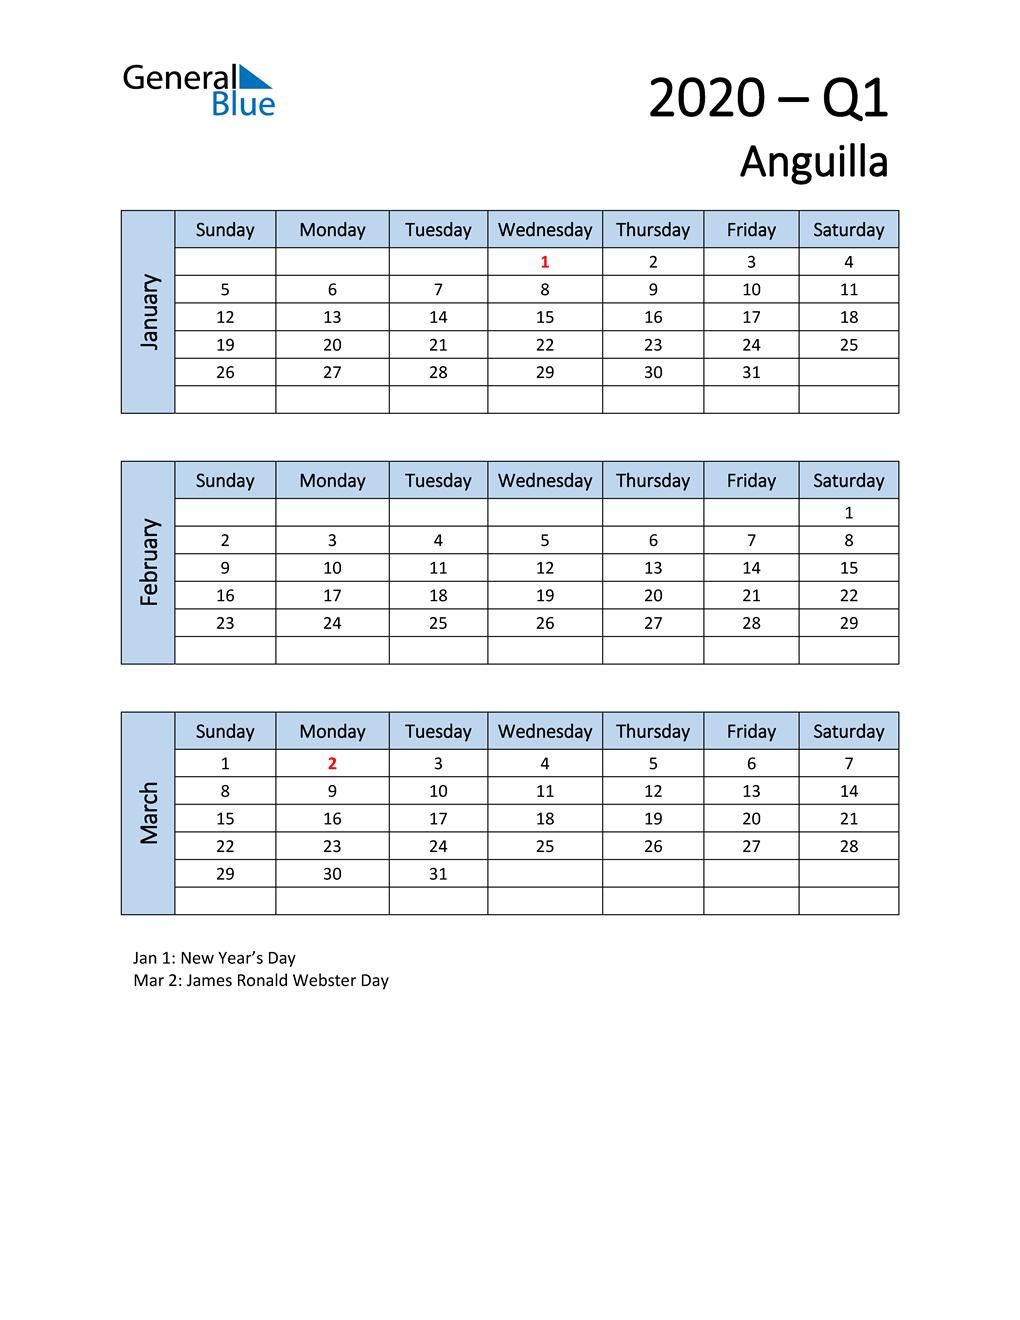 Free Q1 2020 Calendar for Anguilla